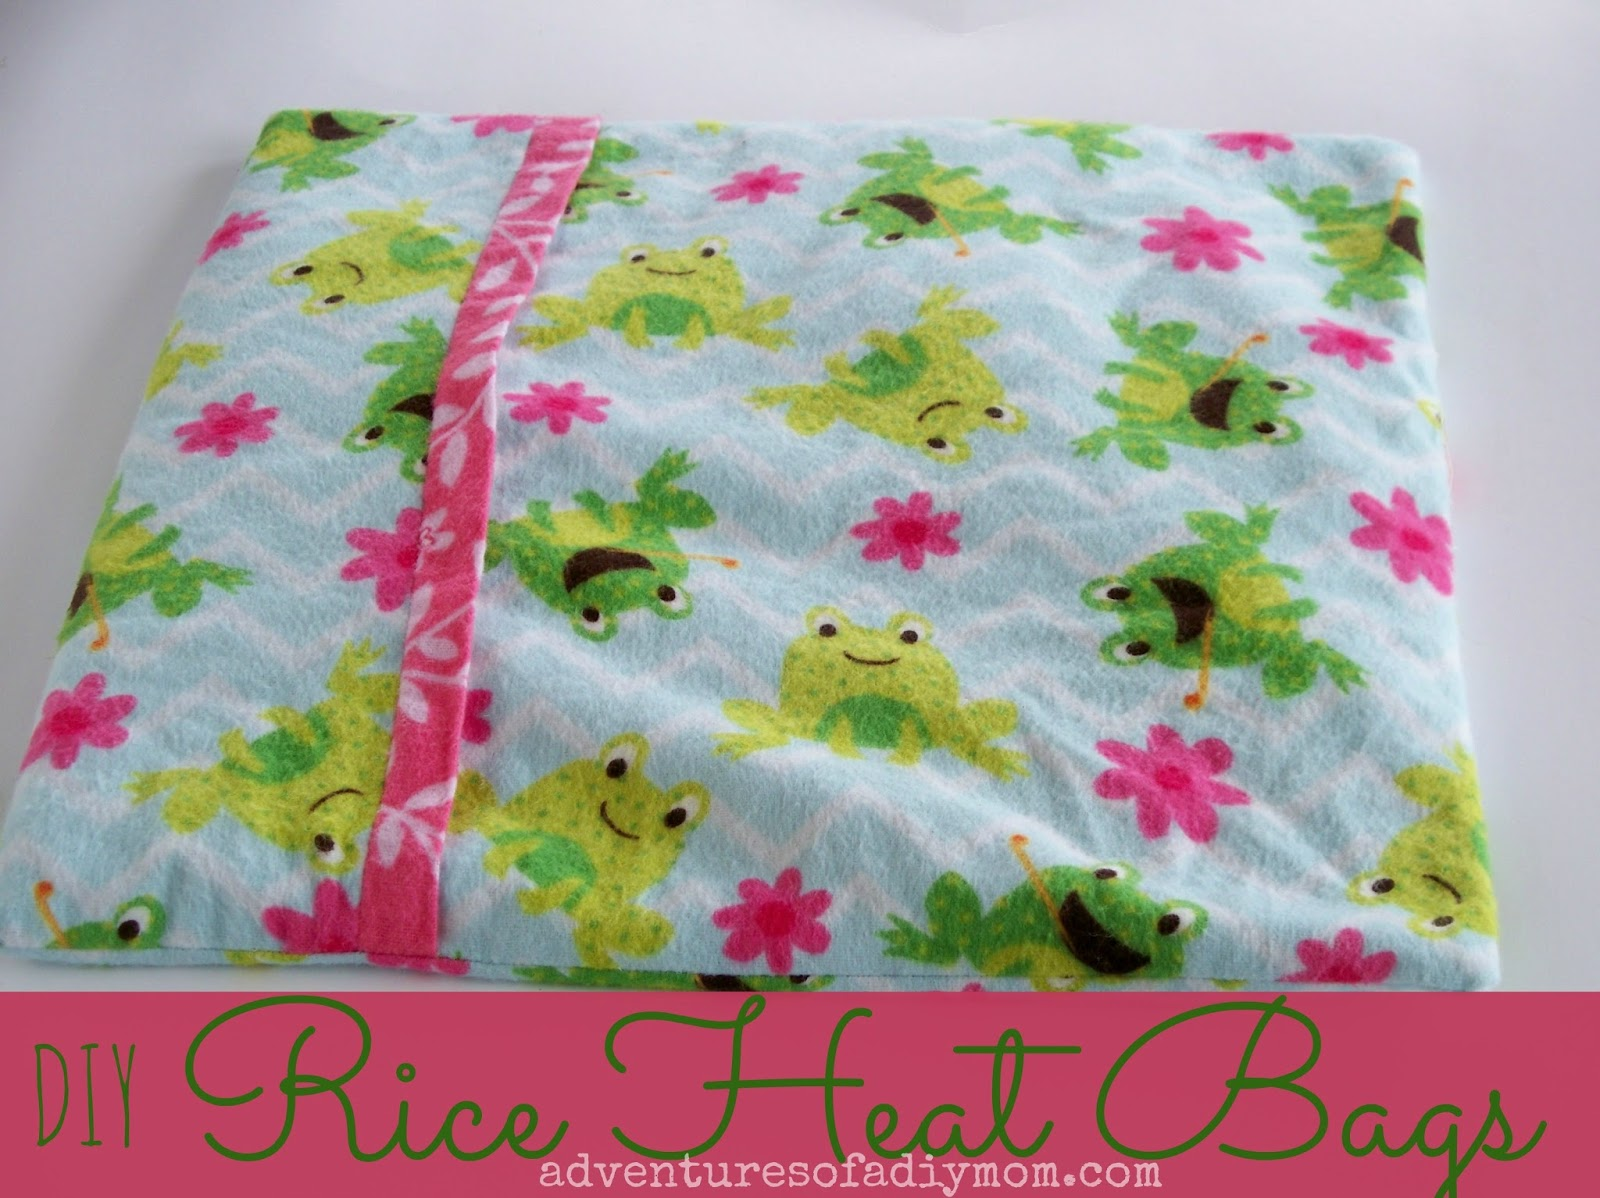 Rice heat bags